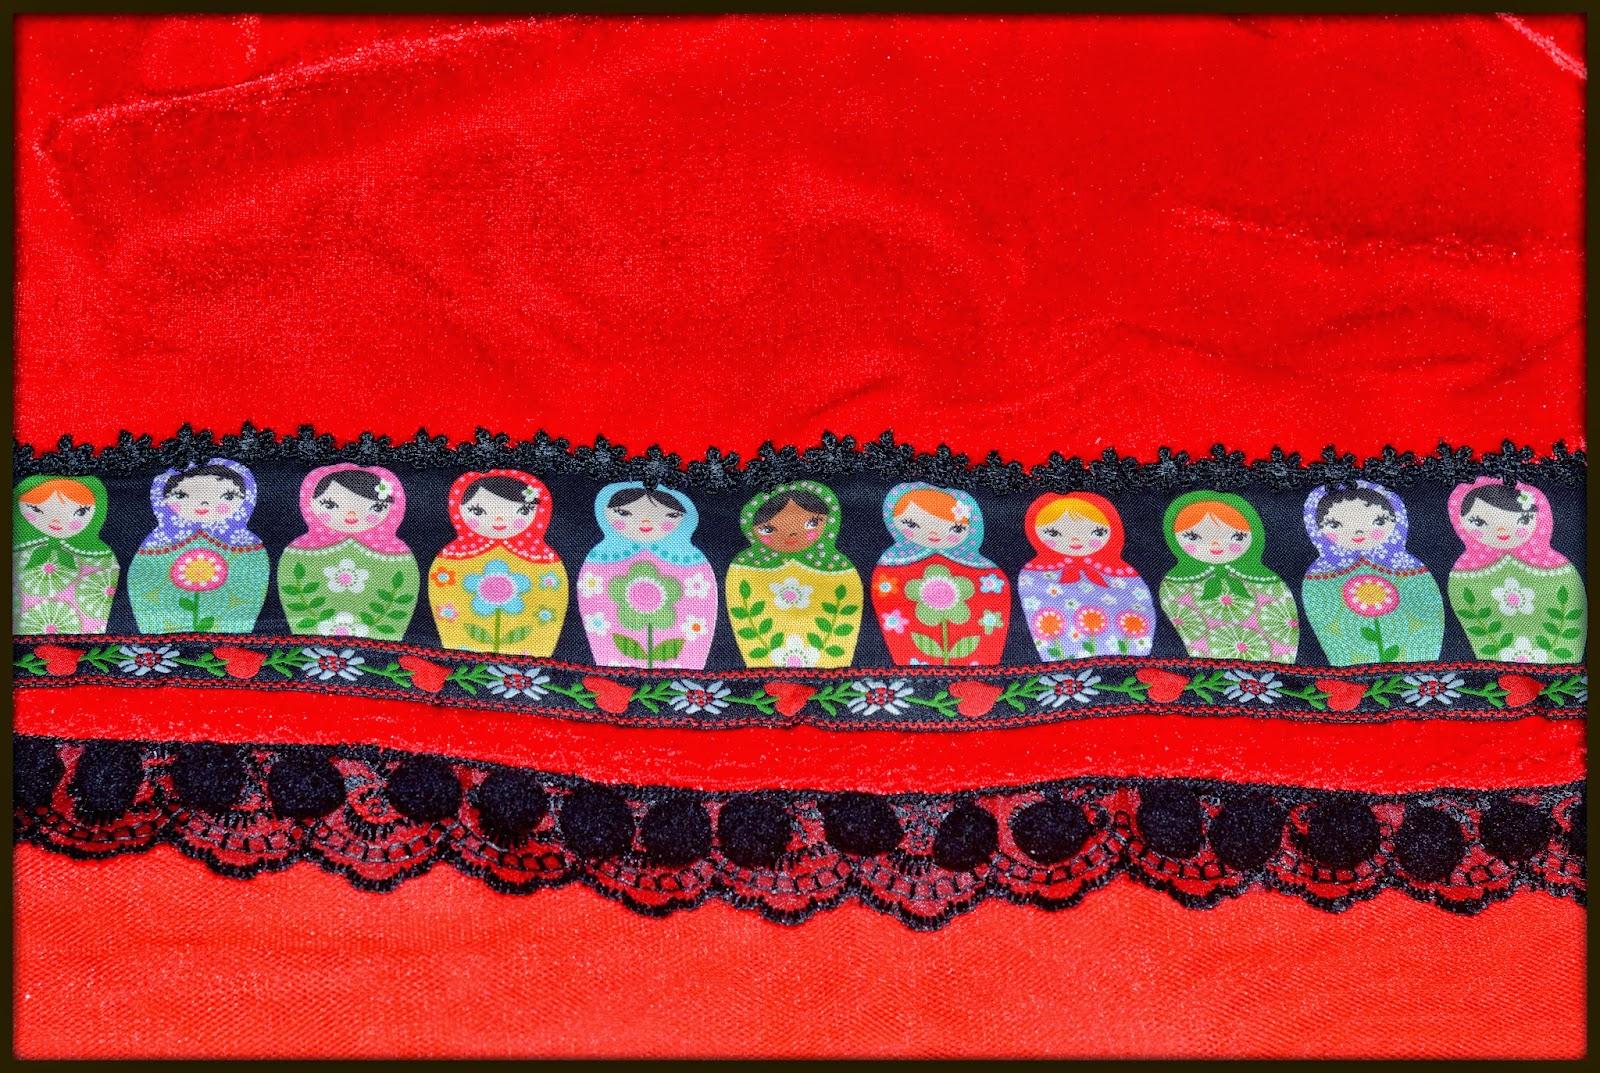 lace tape, matryoshka doll, pom poms tape, red velvet, ribbons applique, lace hem,